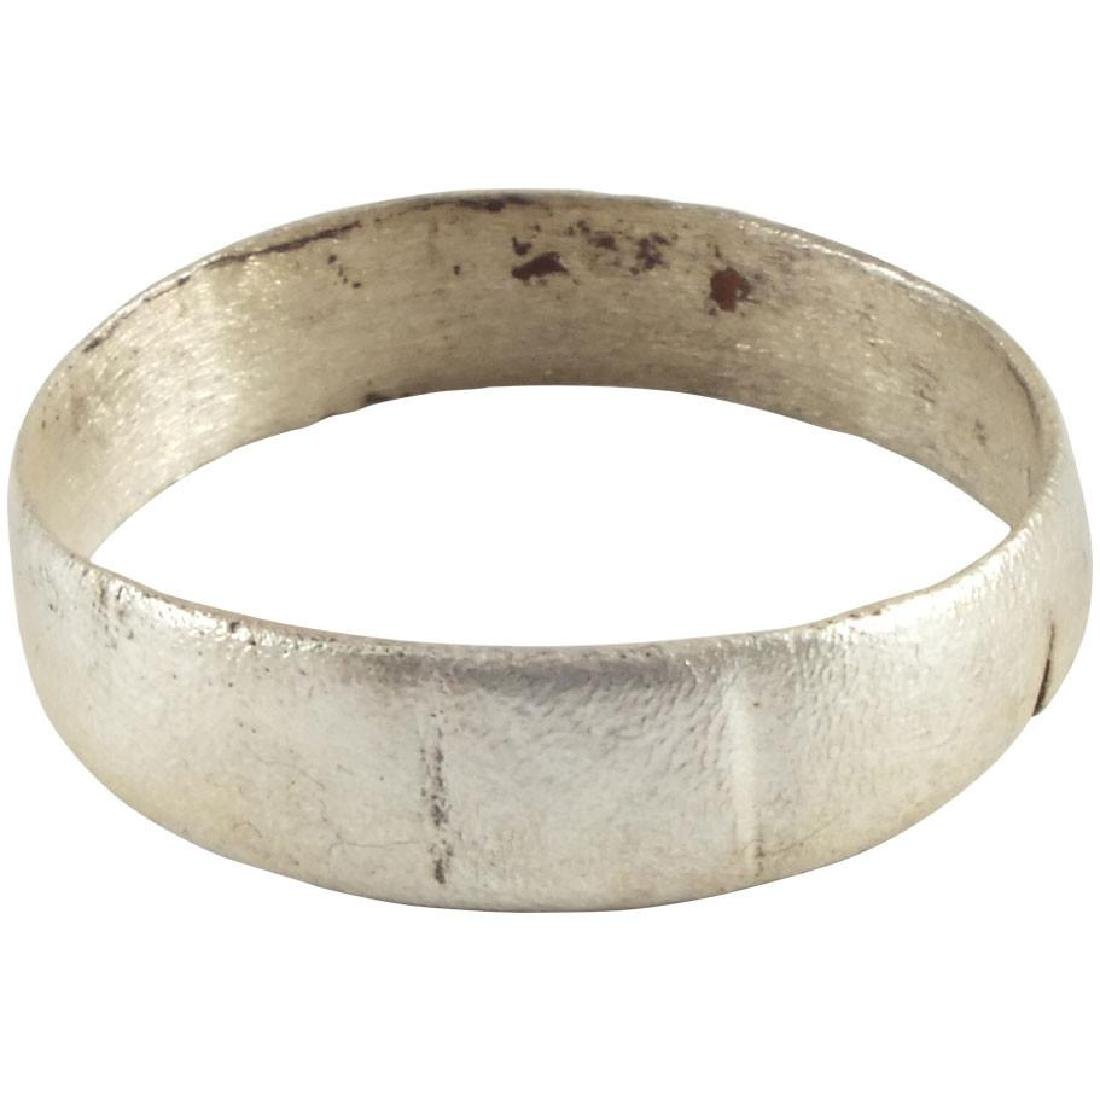 ANCIENT VIKING RING C.900 AD